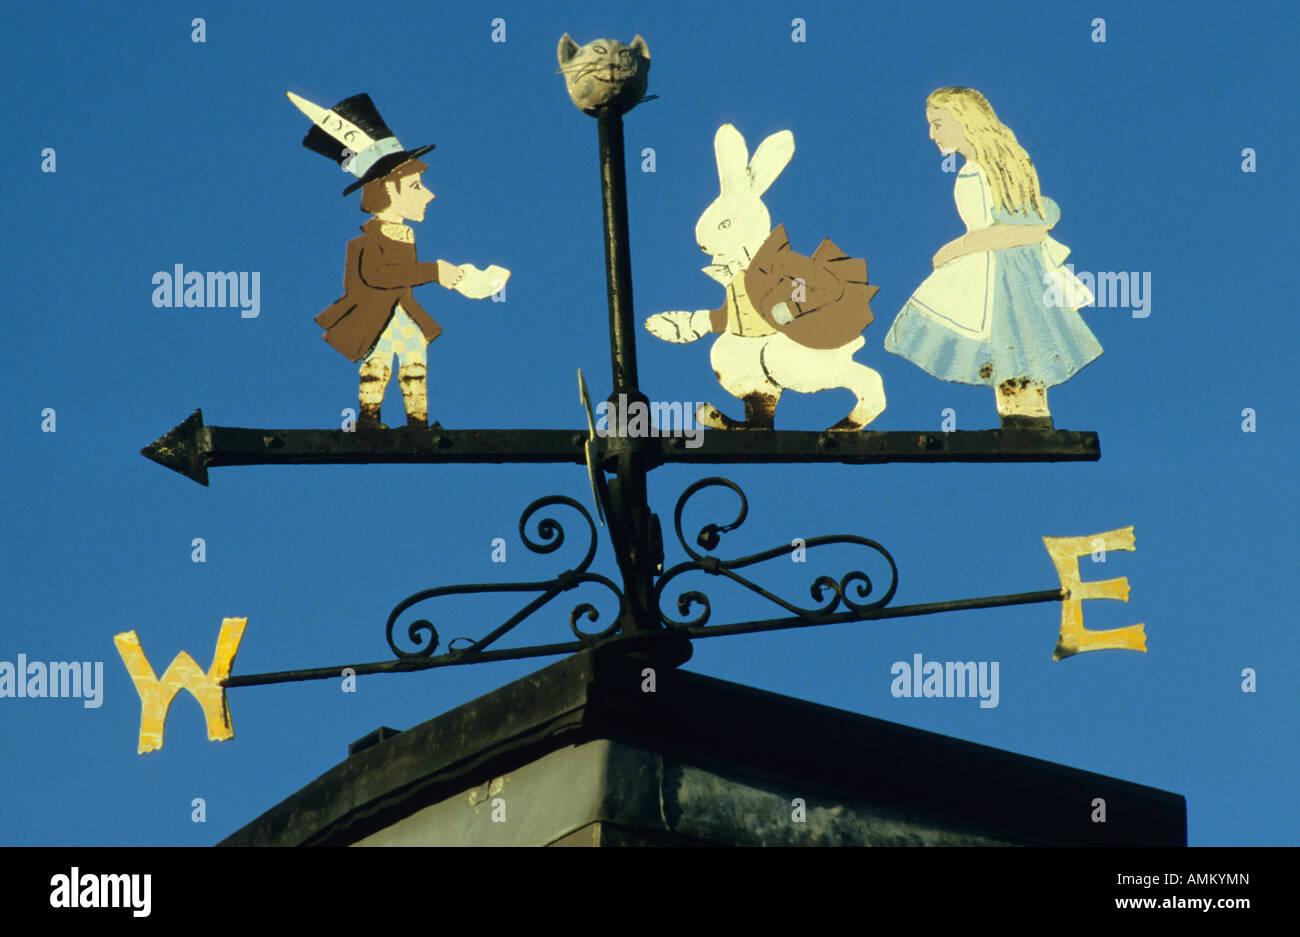 Alice in Wonderland weathervane, Daresbury Parsonage, Cheshire, UK. - Stock Image